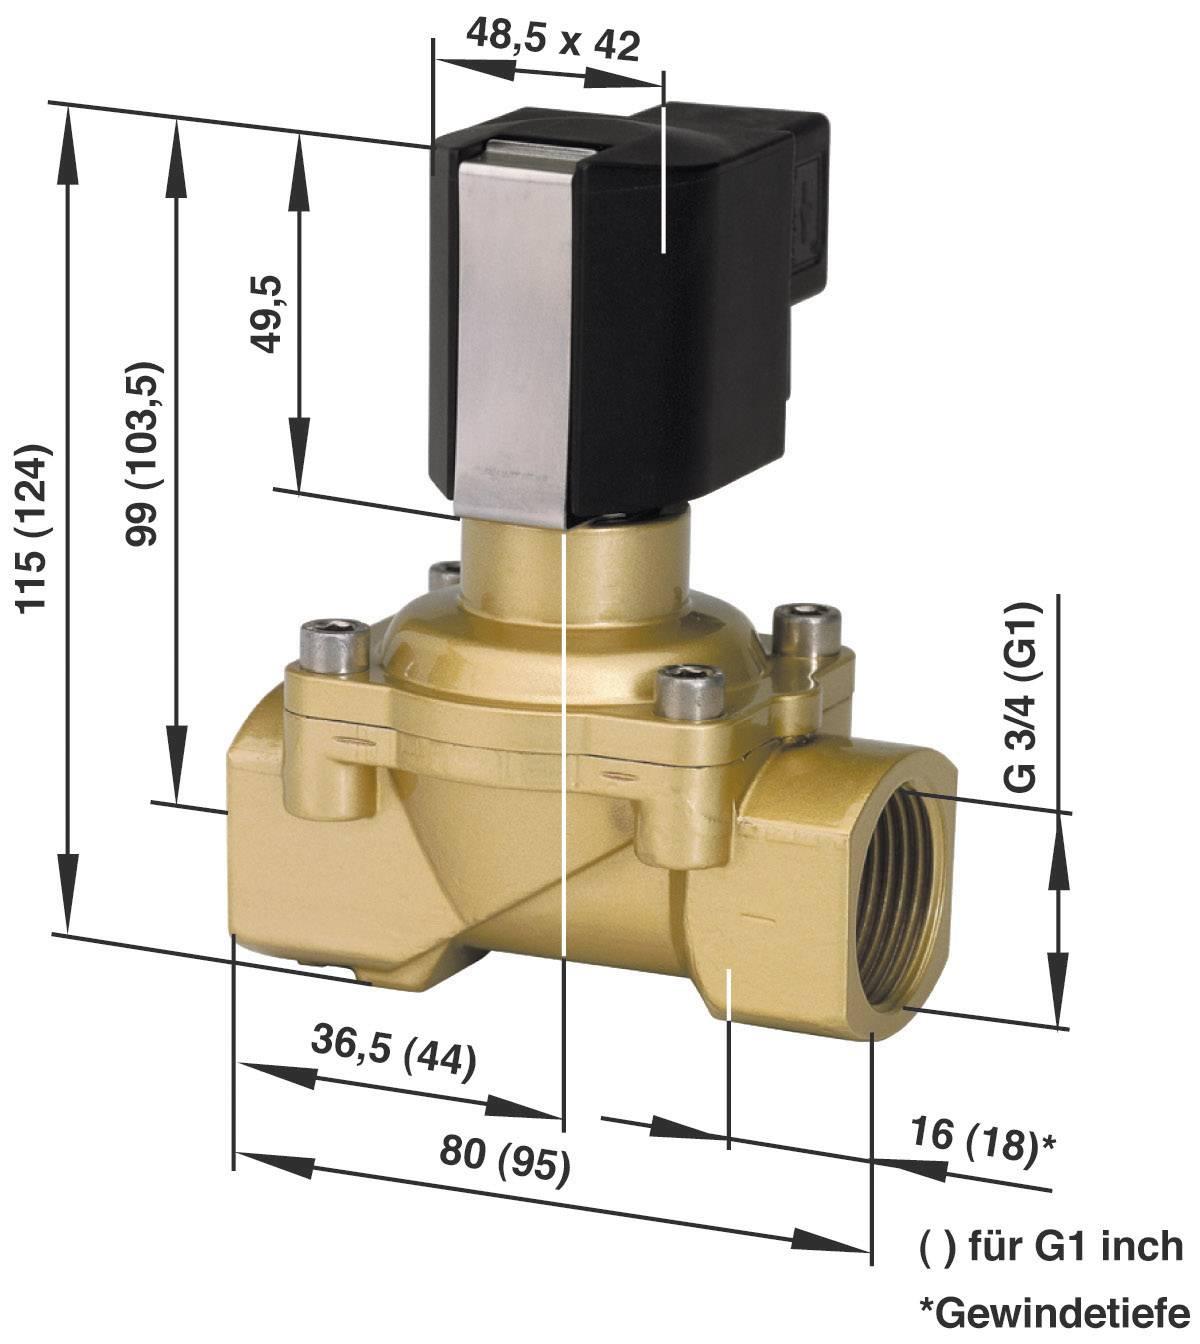 2/2-cestný mechanicky odolný ventil pneumatiky Busch Jost 8254300.9154.23049, G 3/4, 230 V/AC